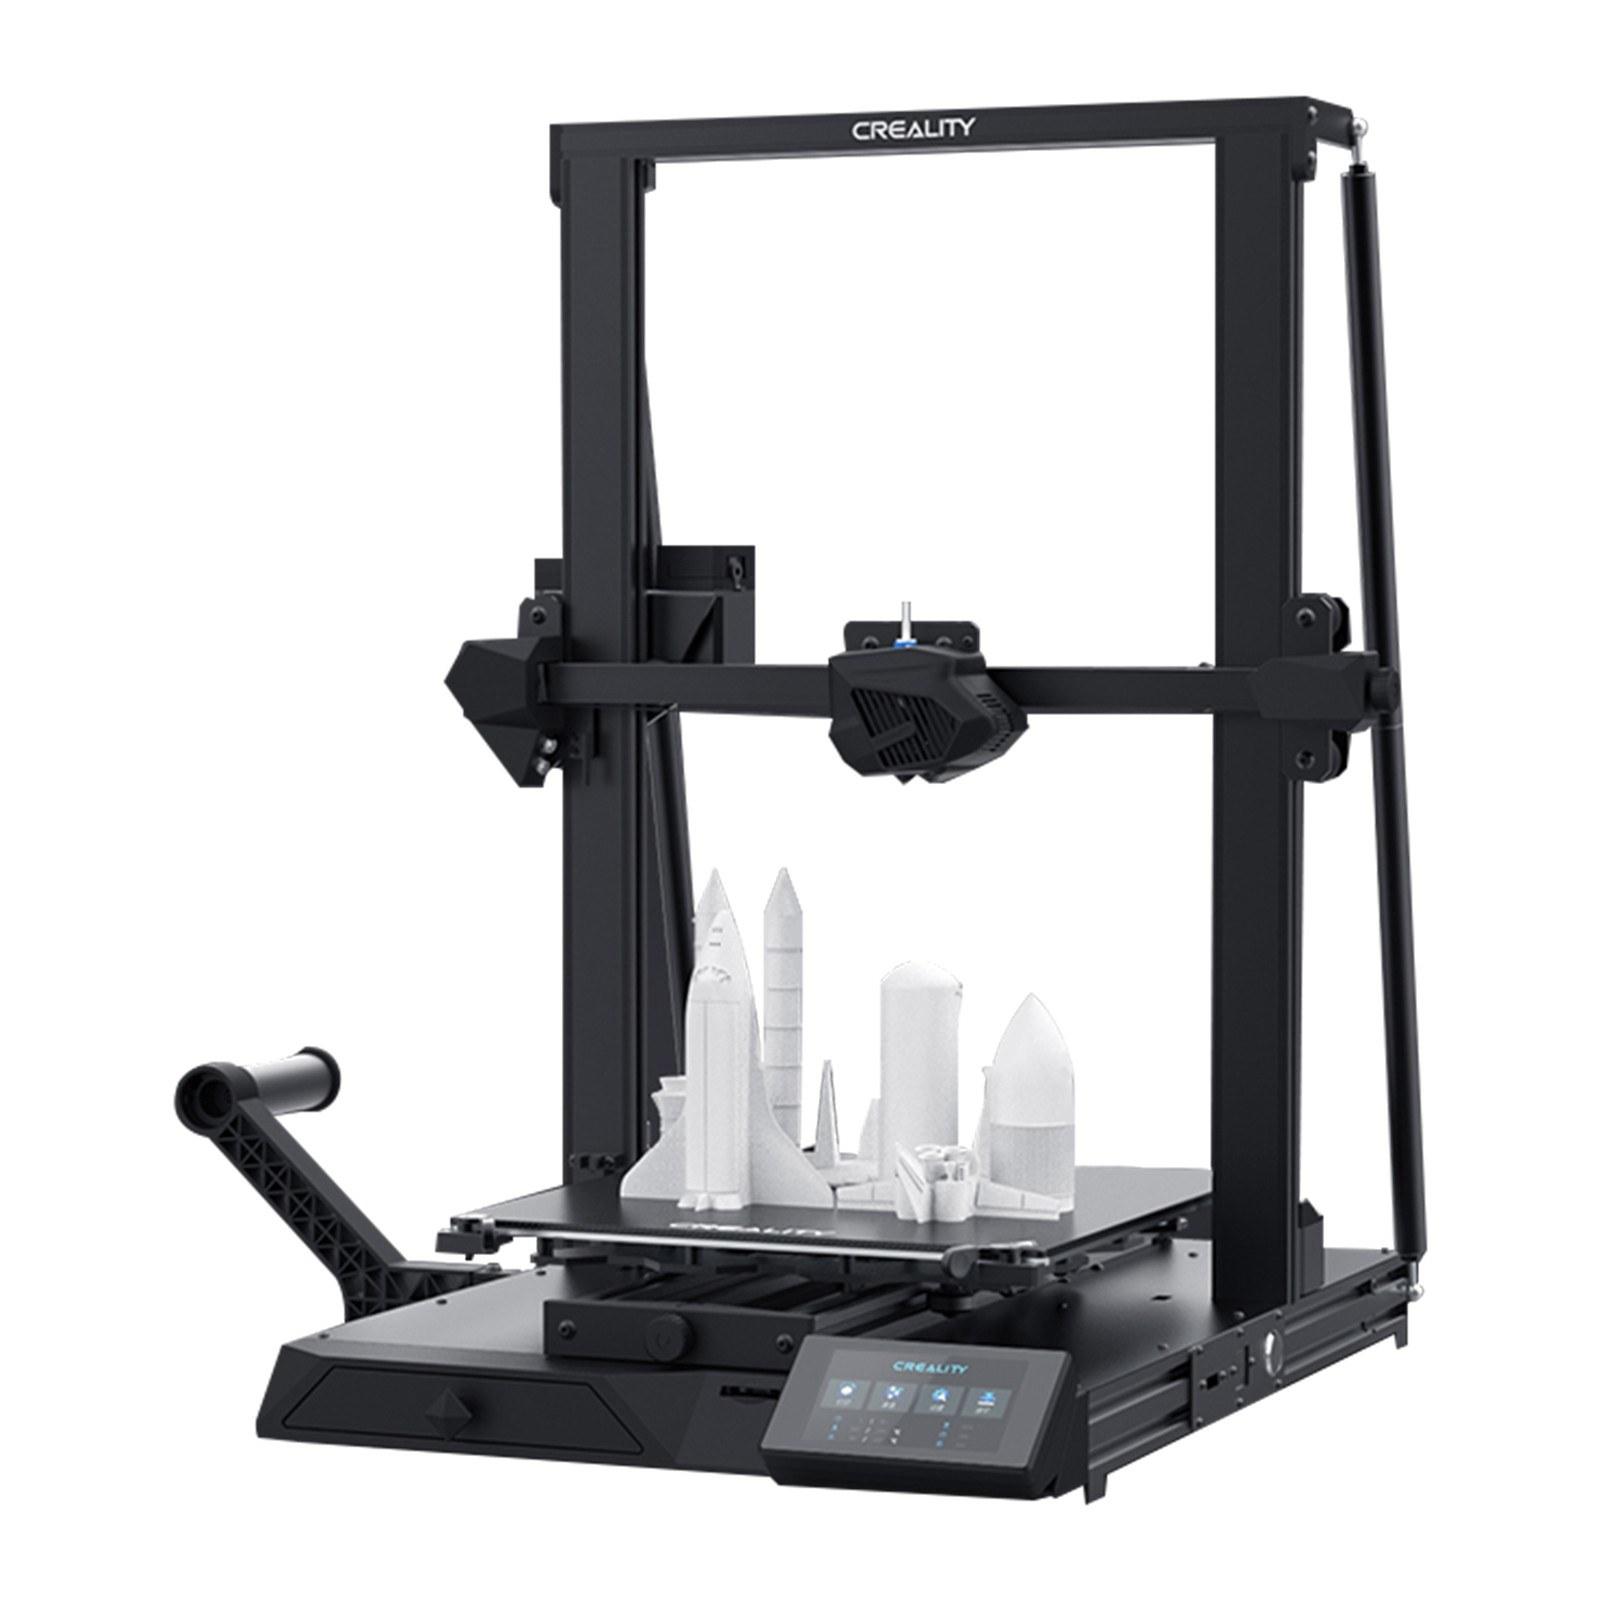 Tomtop - [EU Warehouse] Original Creality CR-10 Smart High Precision 3D Printer, $429 (Inclusive of VAT)